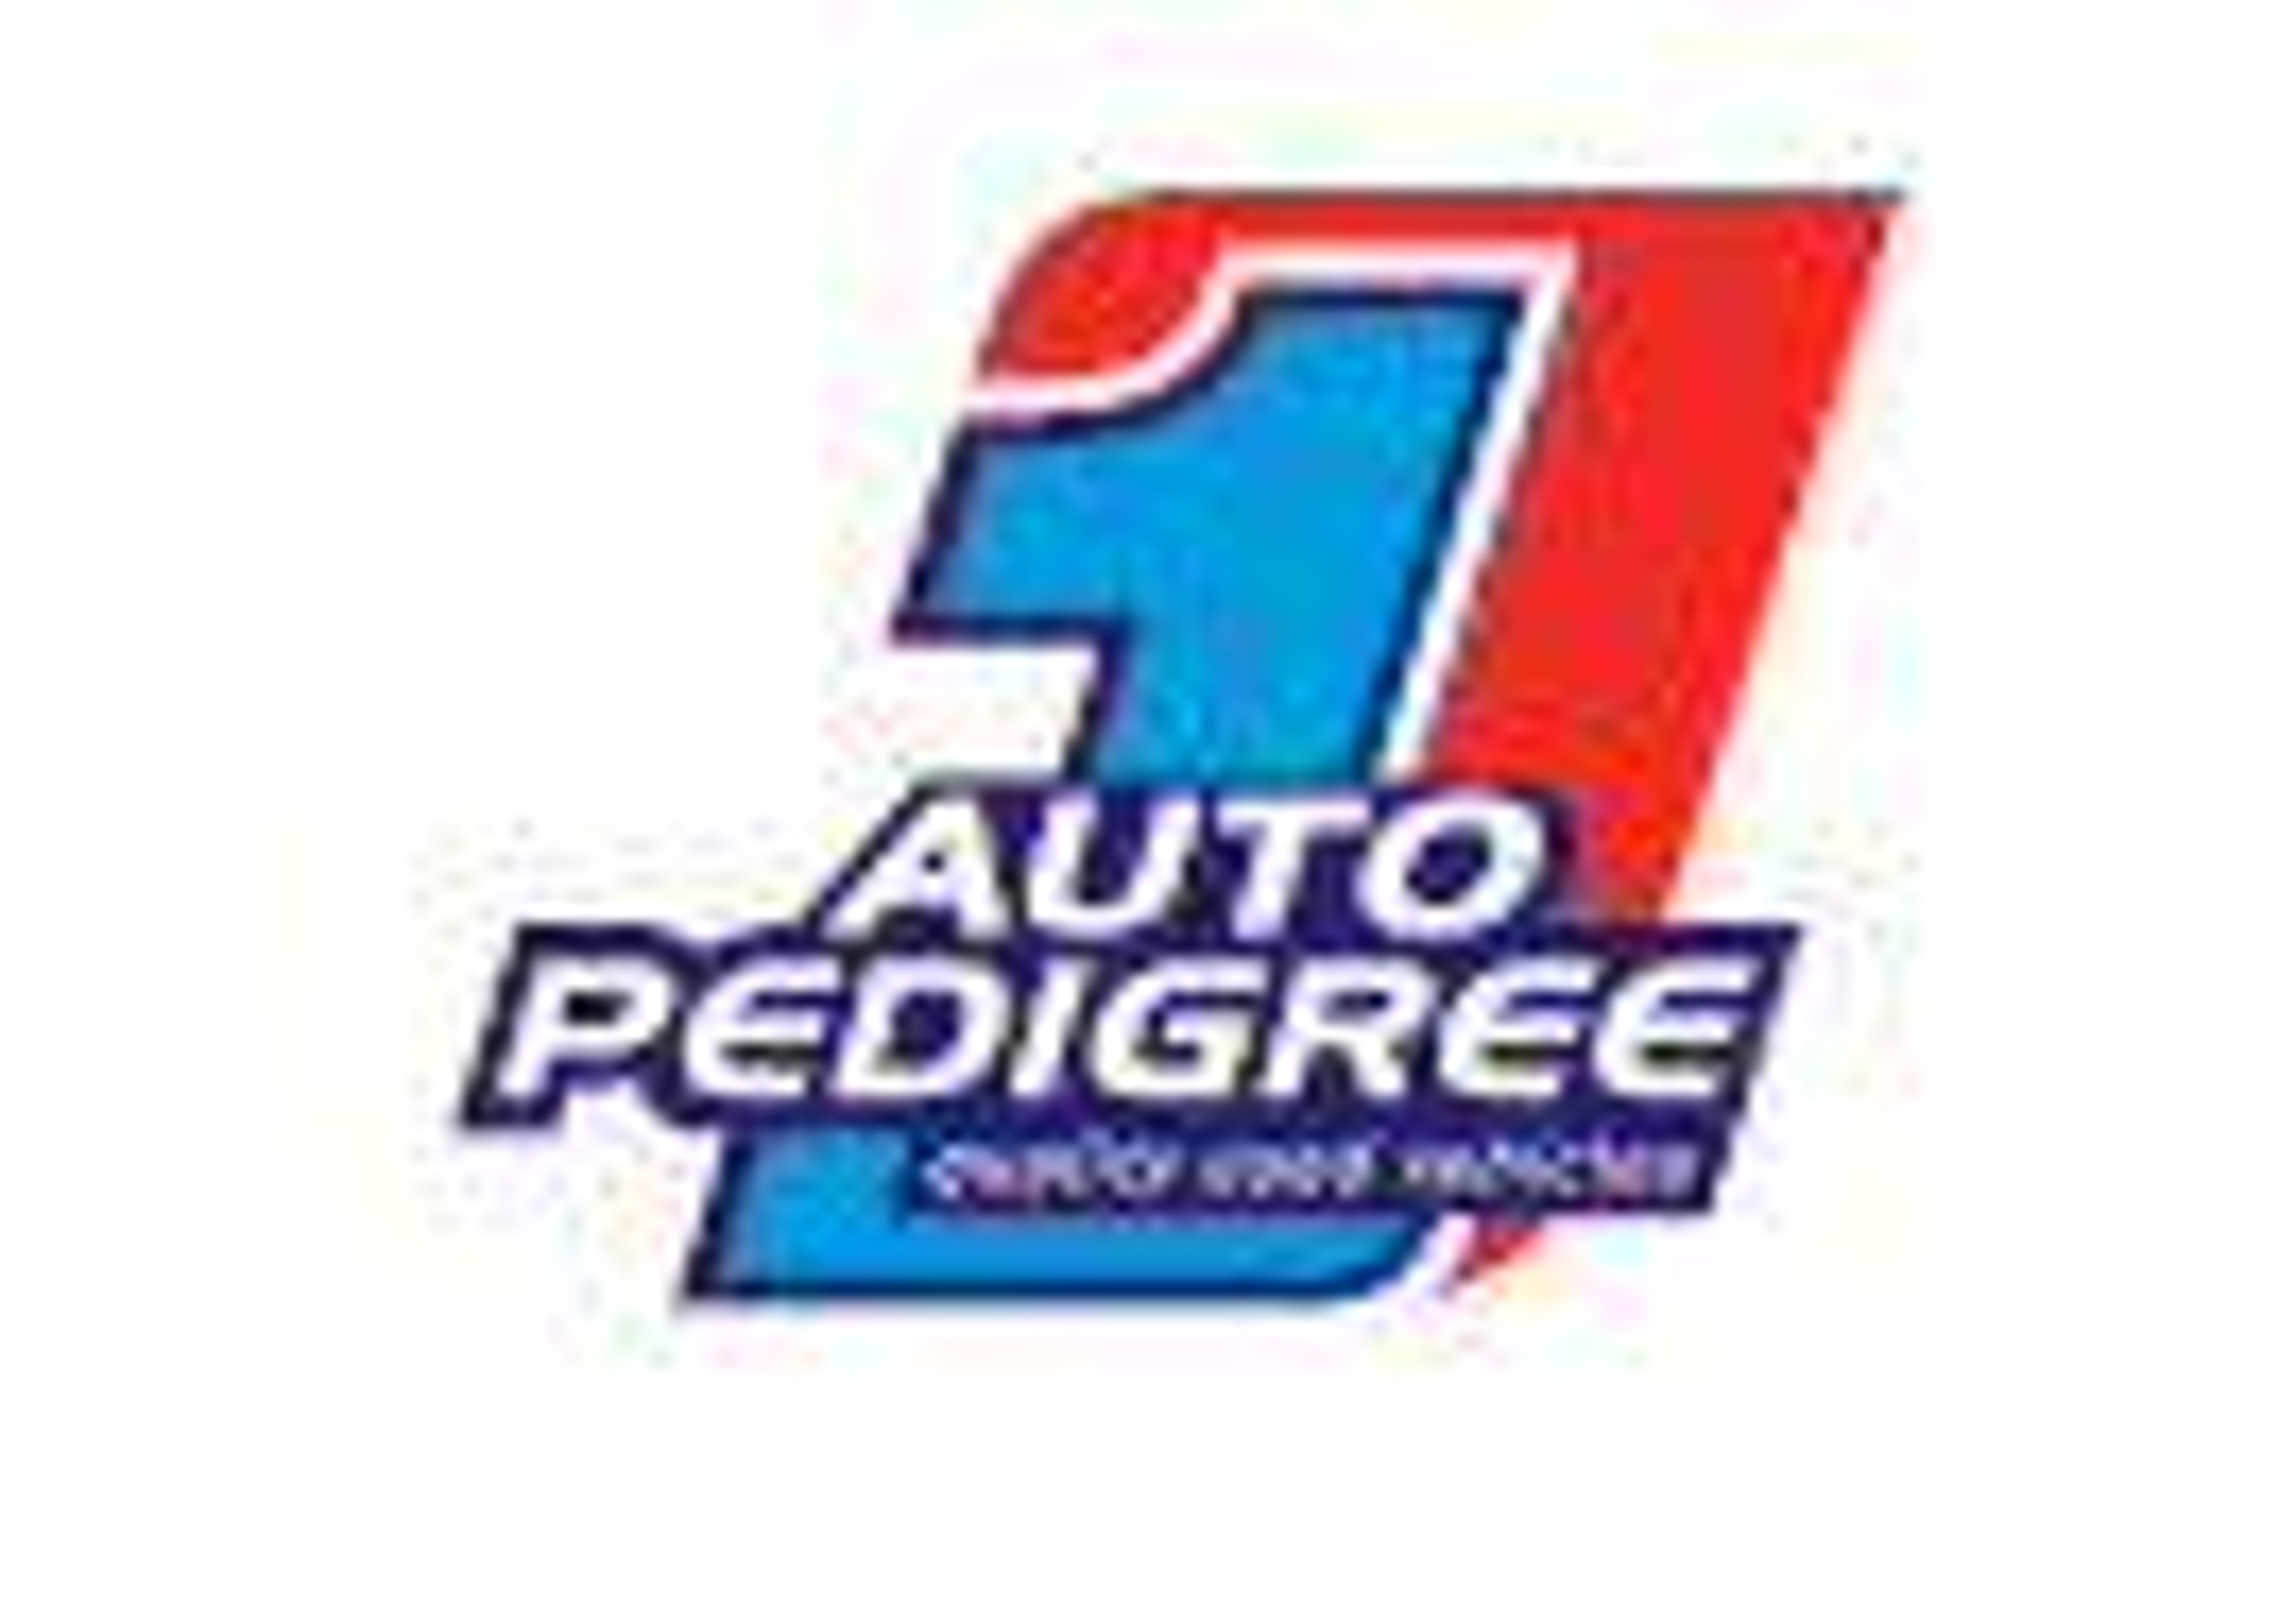 Auto Pedigree